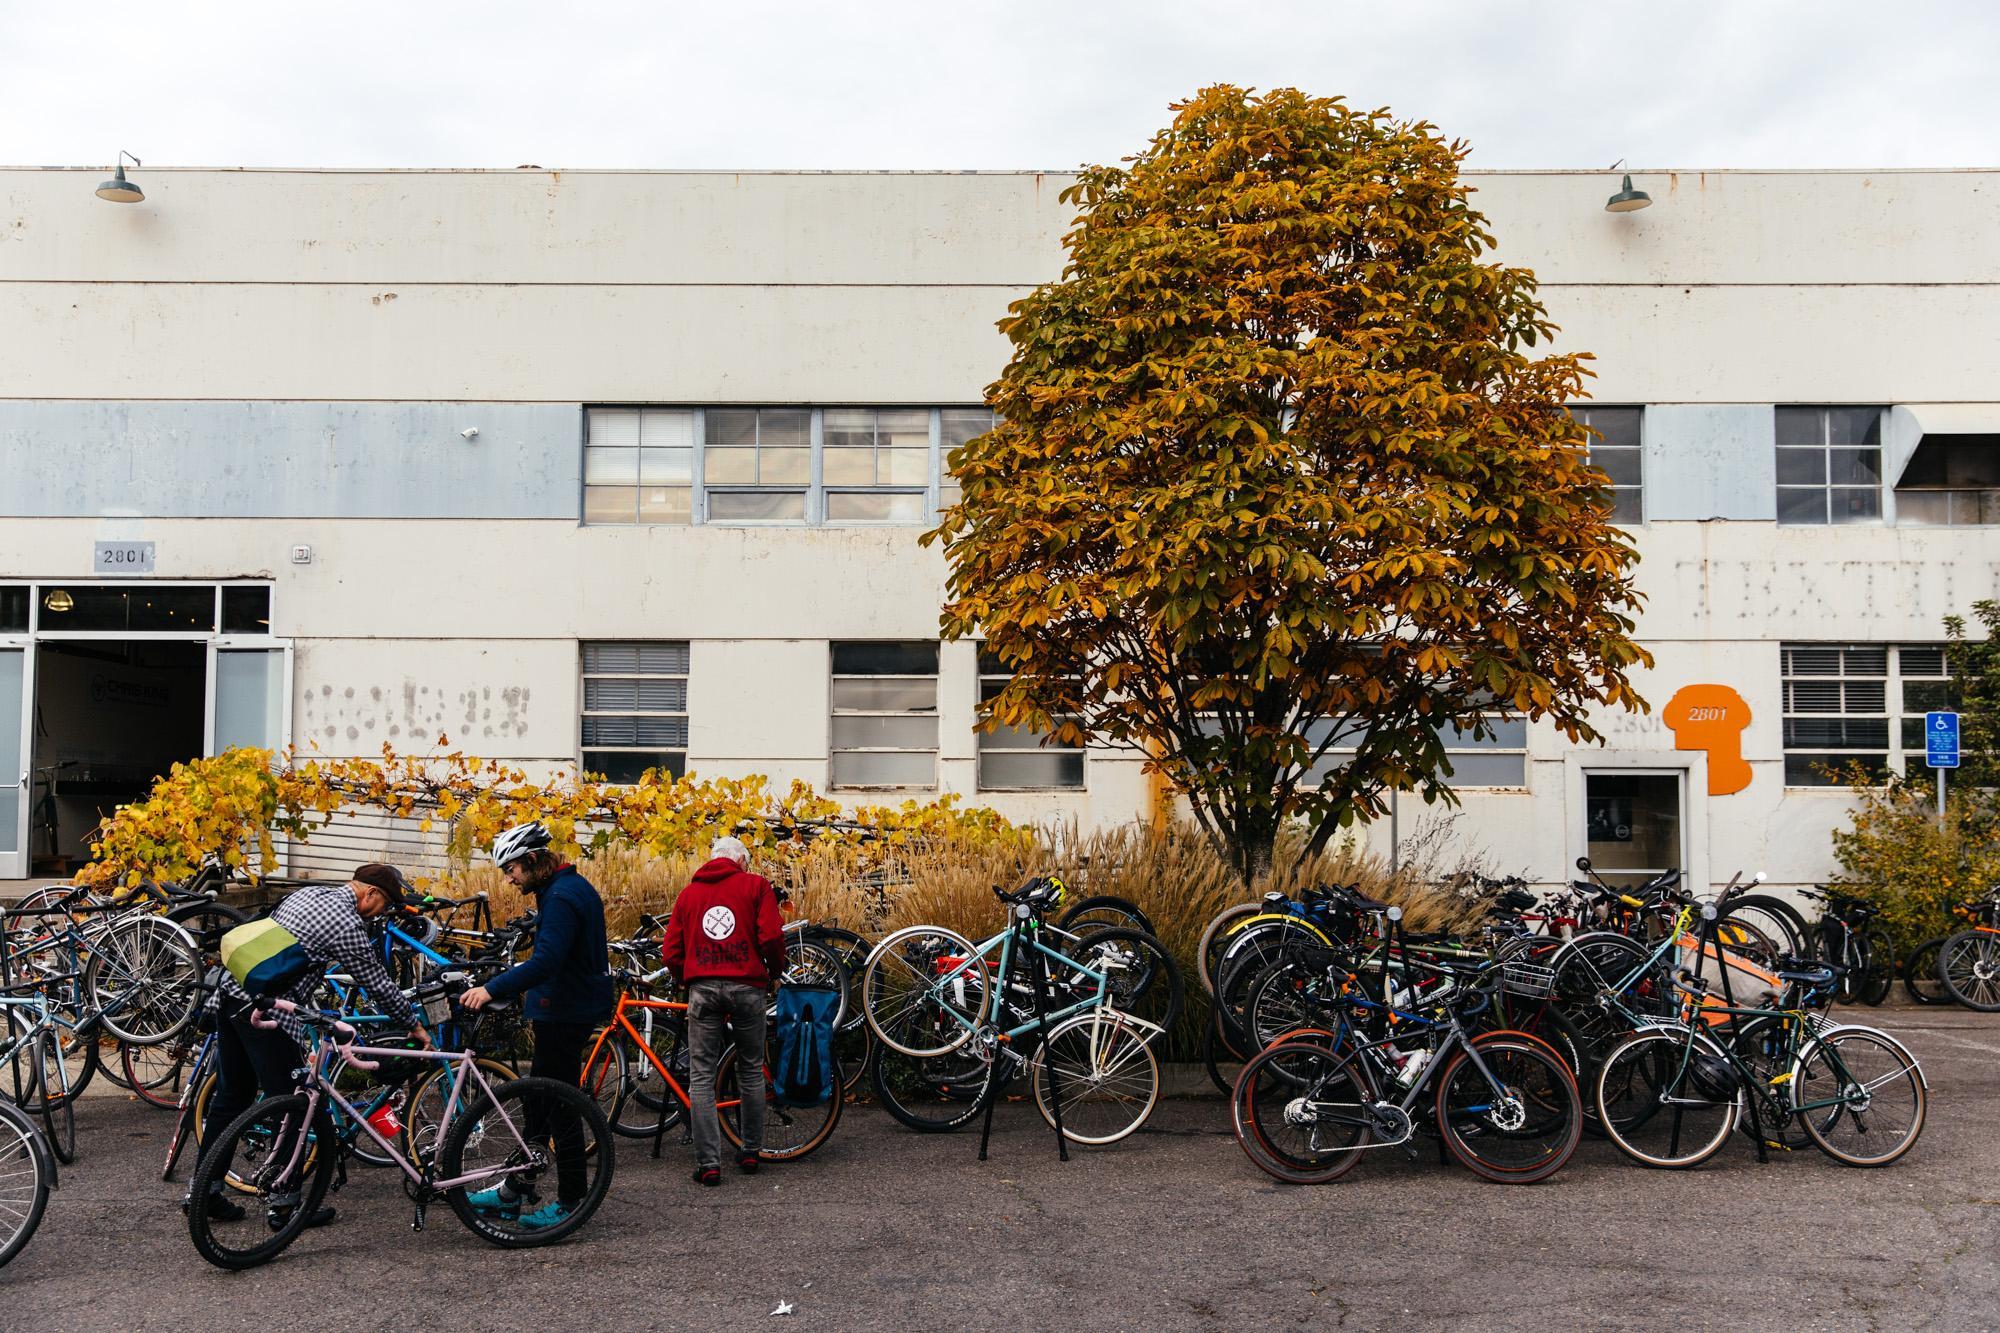 Bike parking!